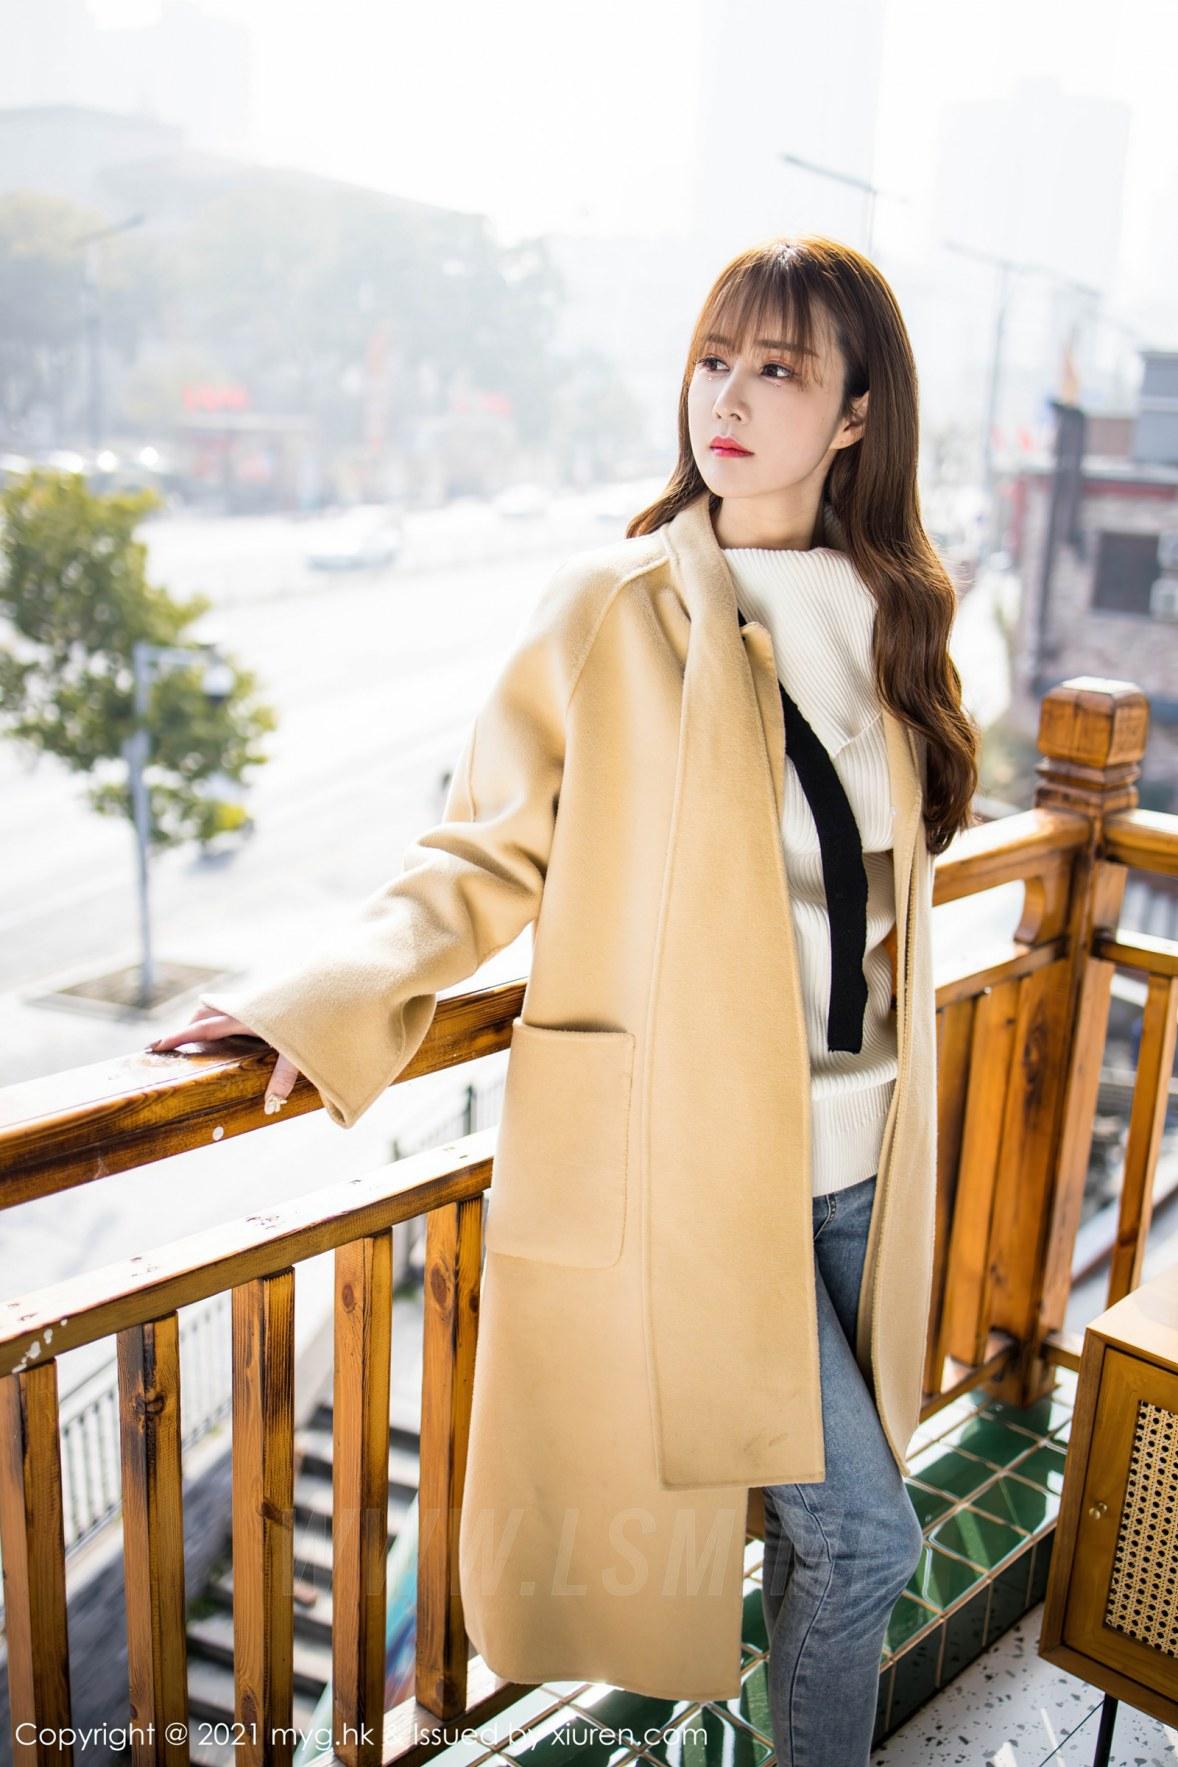 MyGirl 美媛馆 Vol.487 清甜可人 小兜儿 新人美眉 - 2